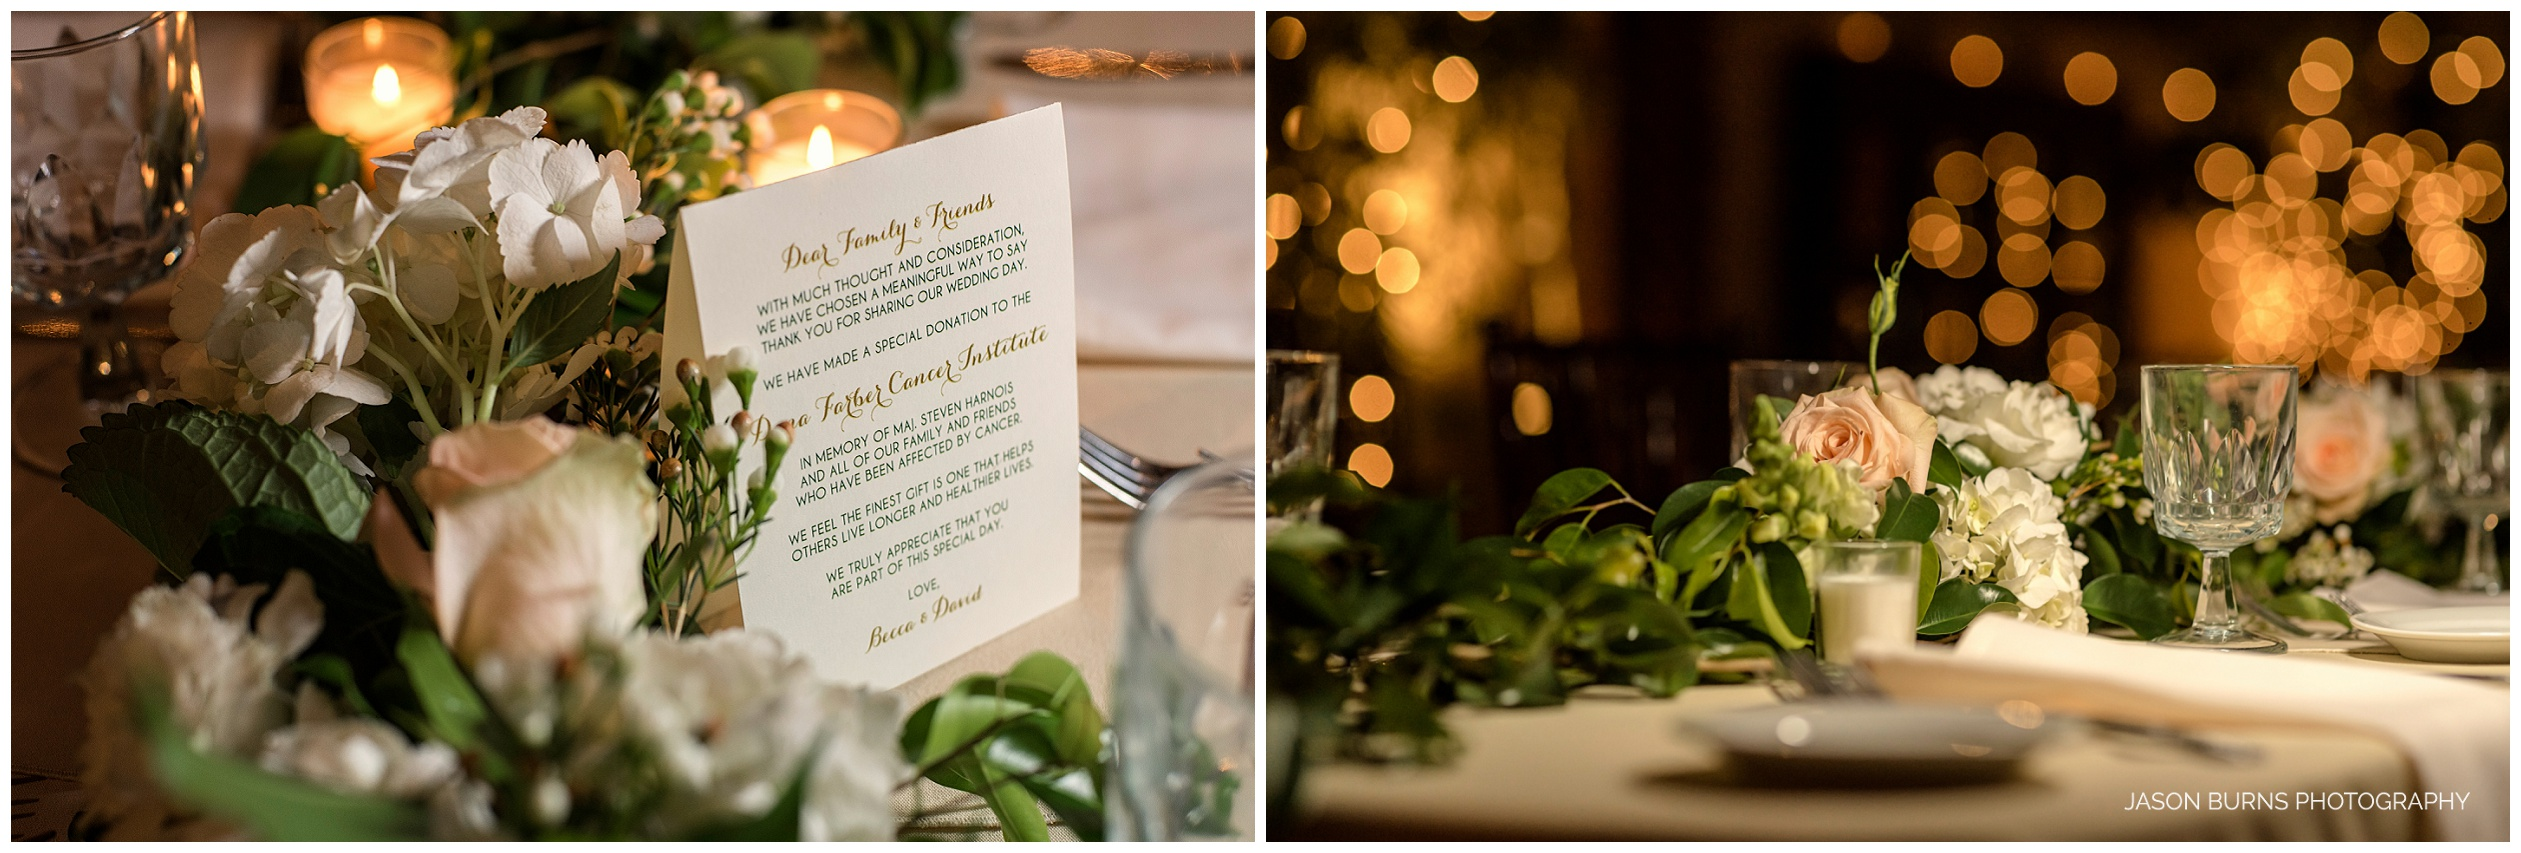 Hacienda Restaurant Wedding 041